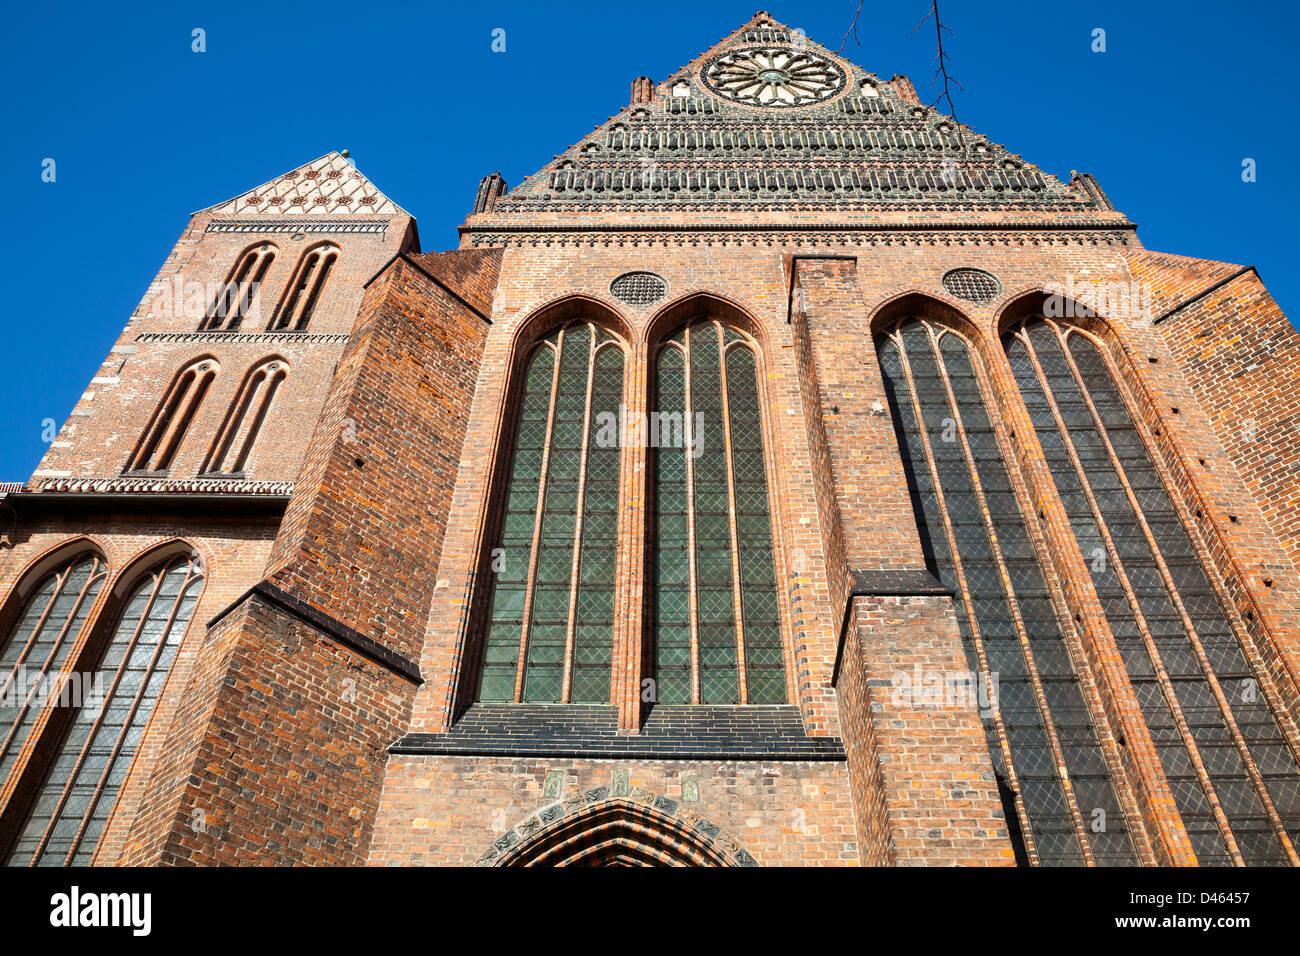 Nikolaikirche, Wismar, Mecklenburg Vorpommern, Germany - Stock Image